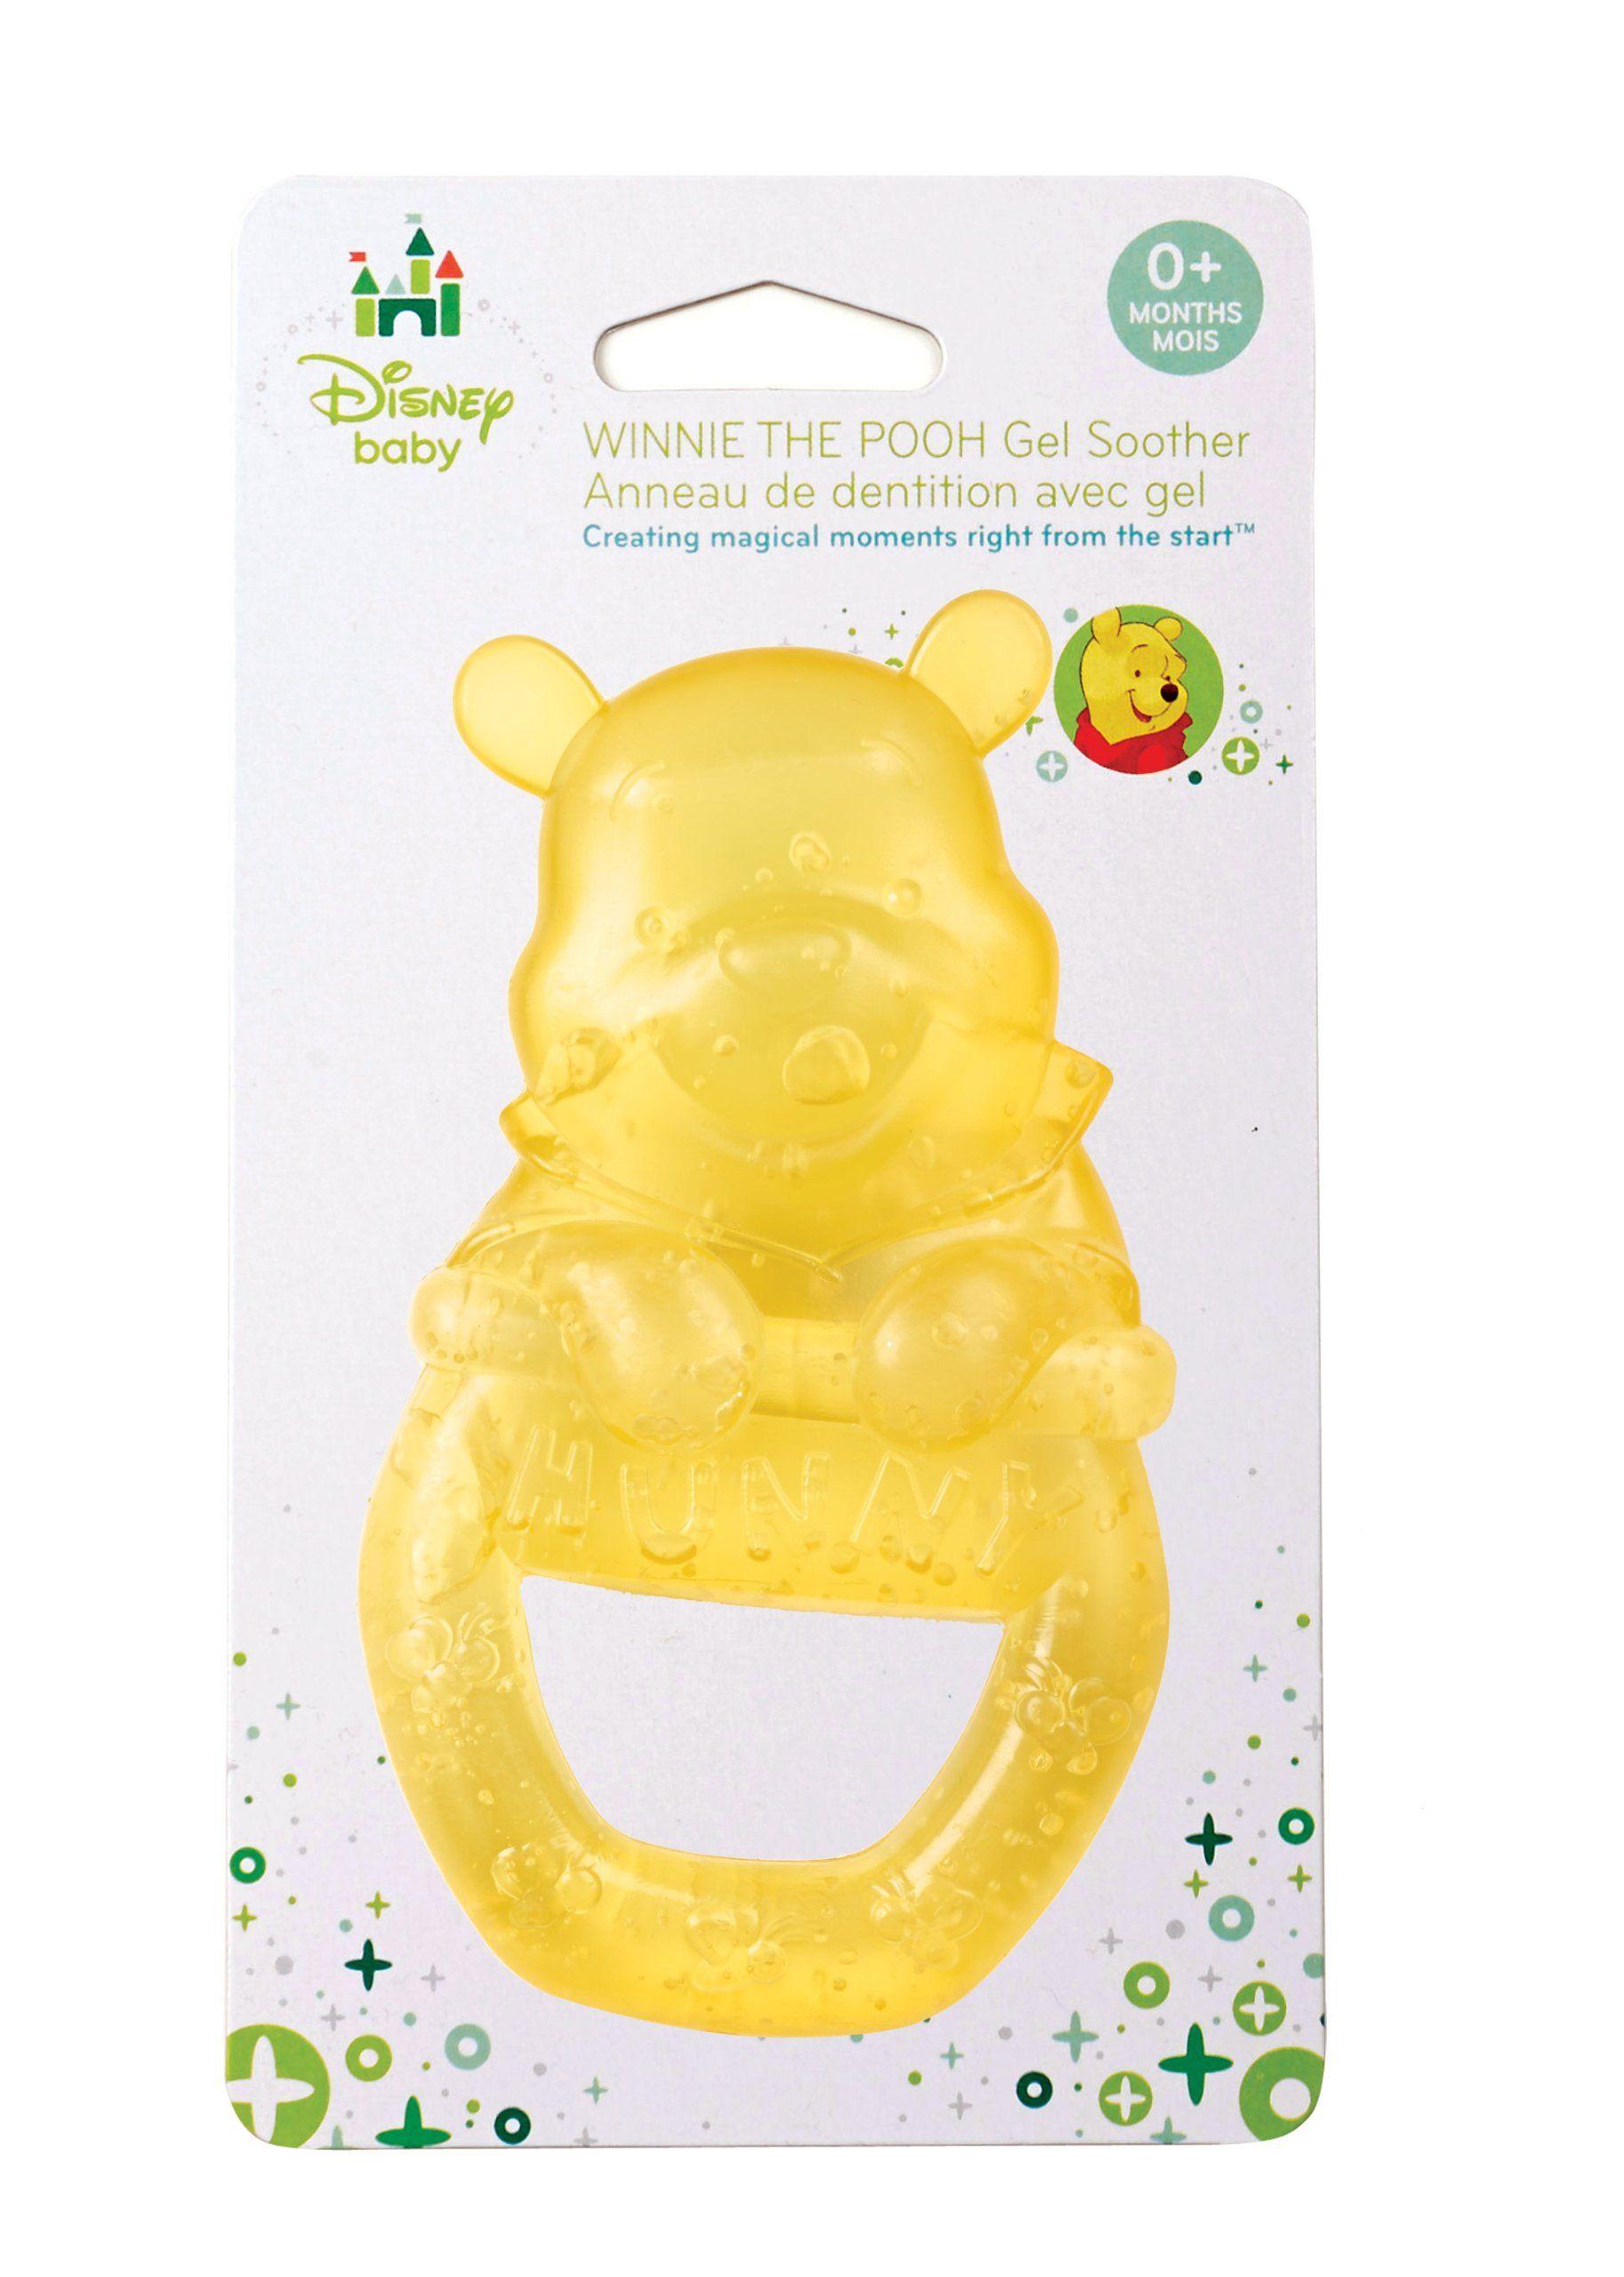 amazoncom kids preferred disney baby gel soother winnie the pooh baby